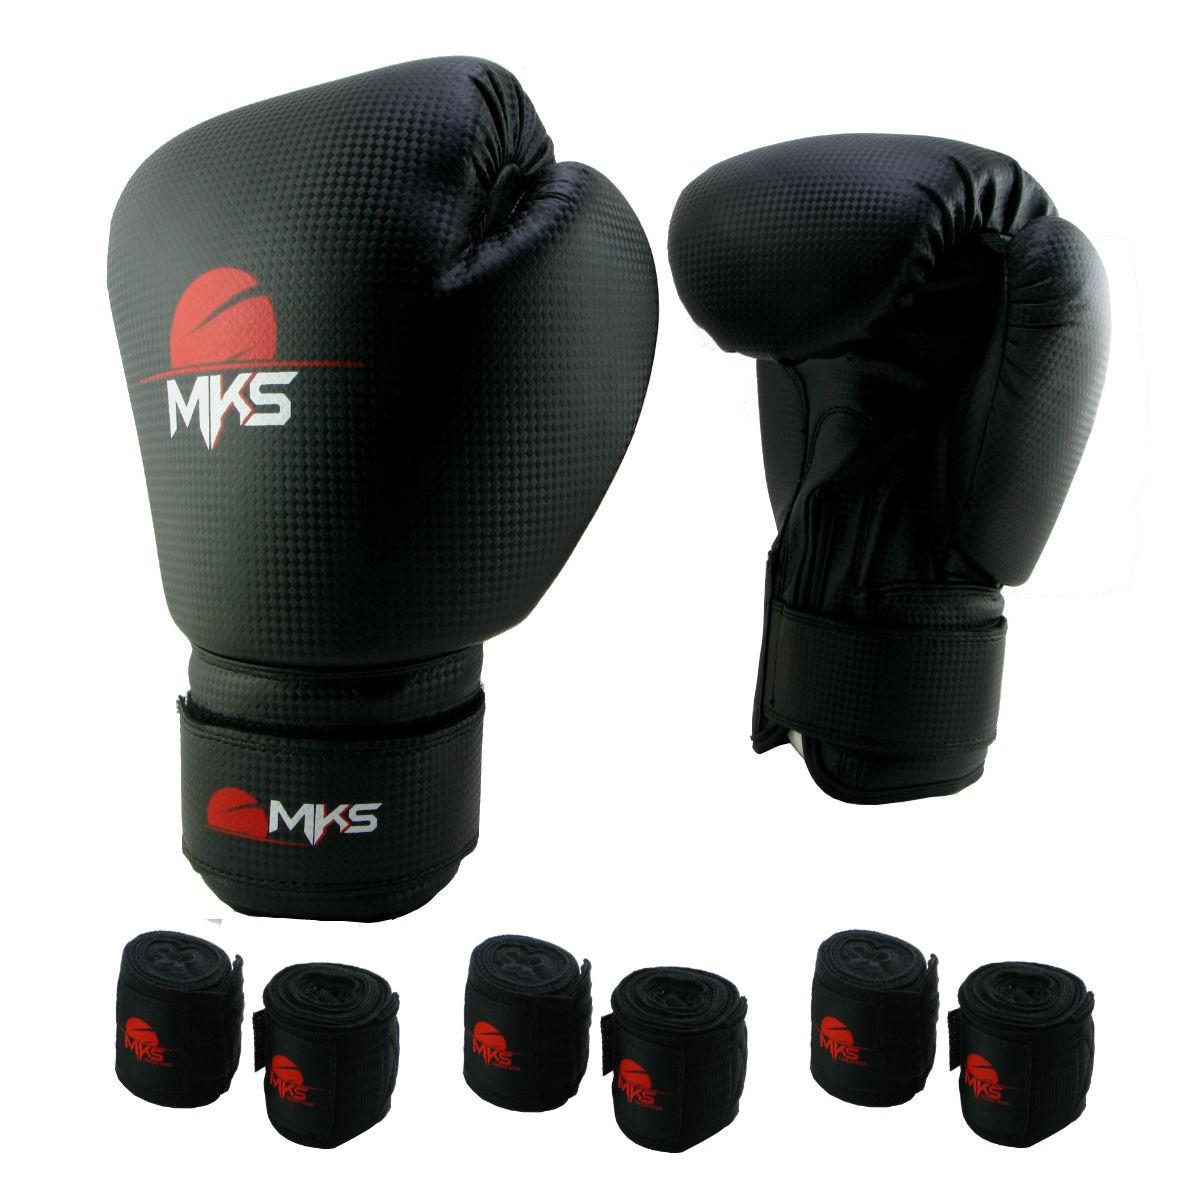 Luva de Boxe Prospect MKS Preta 12 oz +  03 bandagem